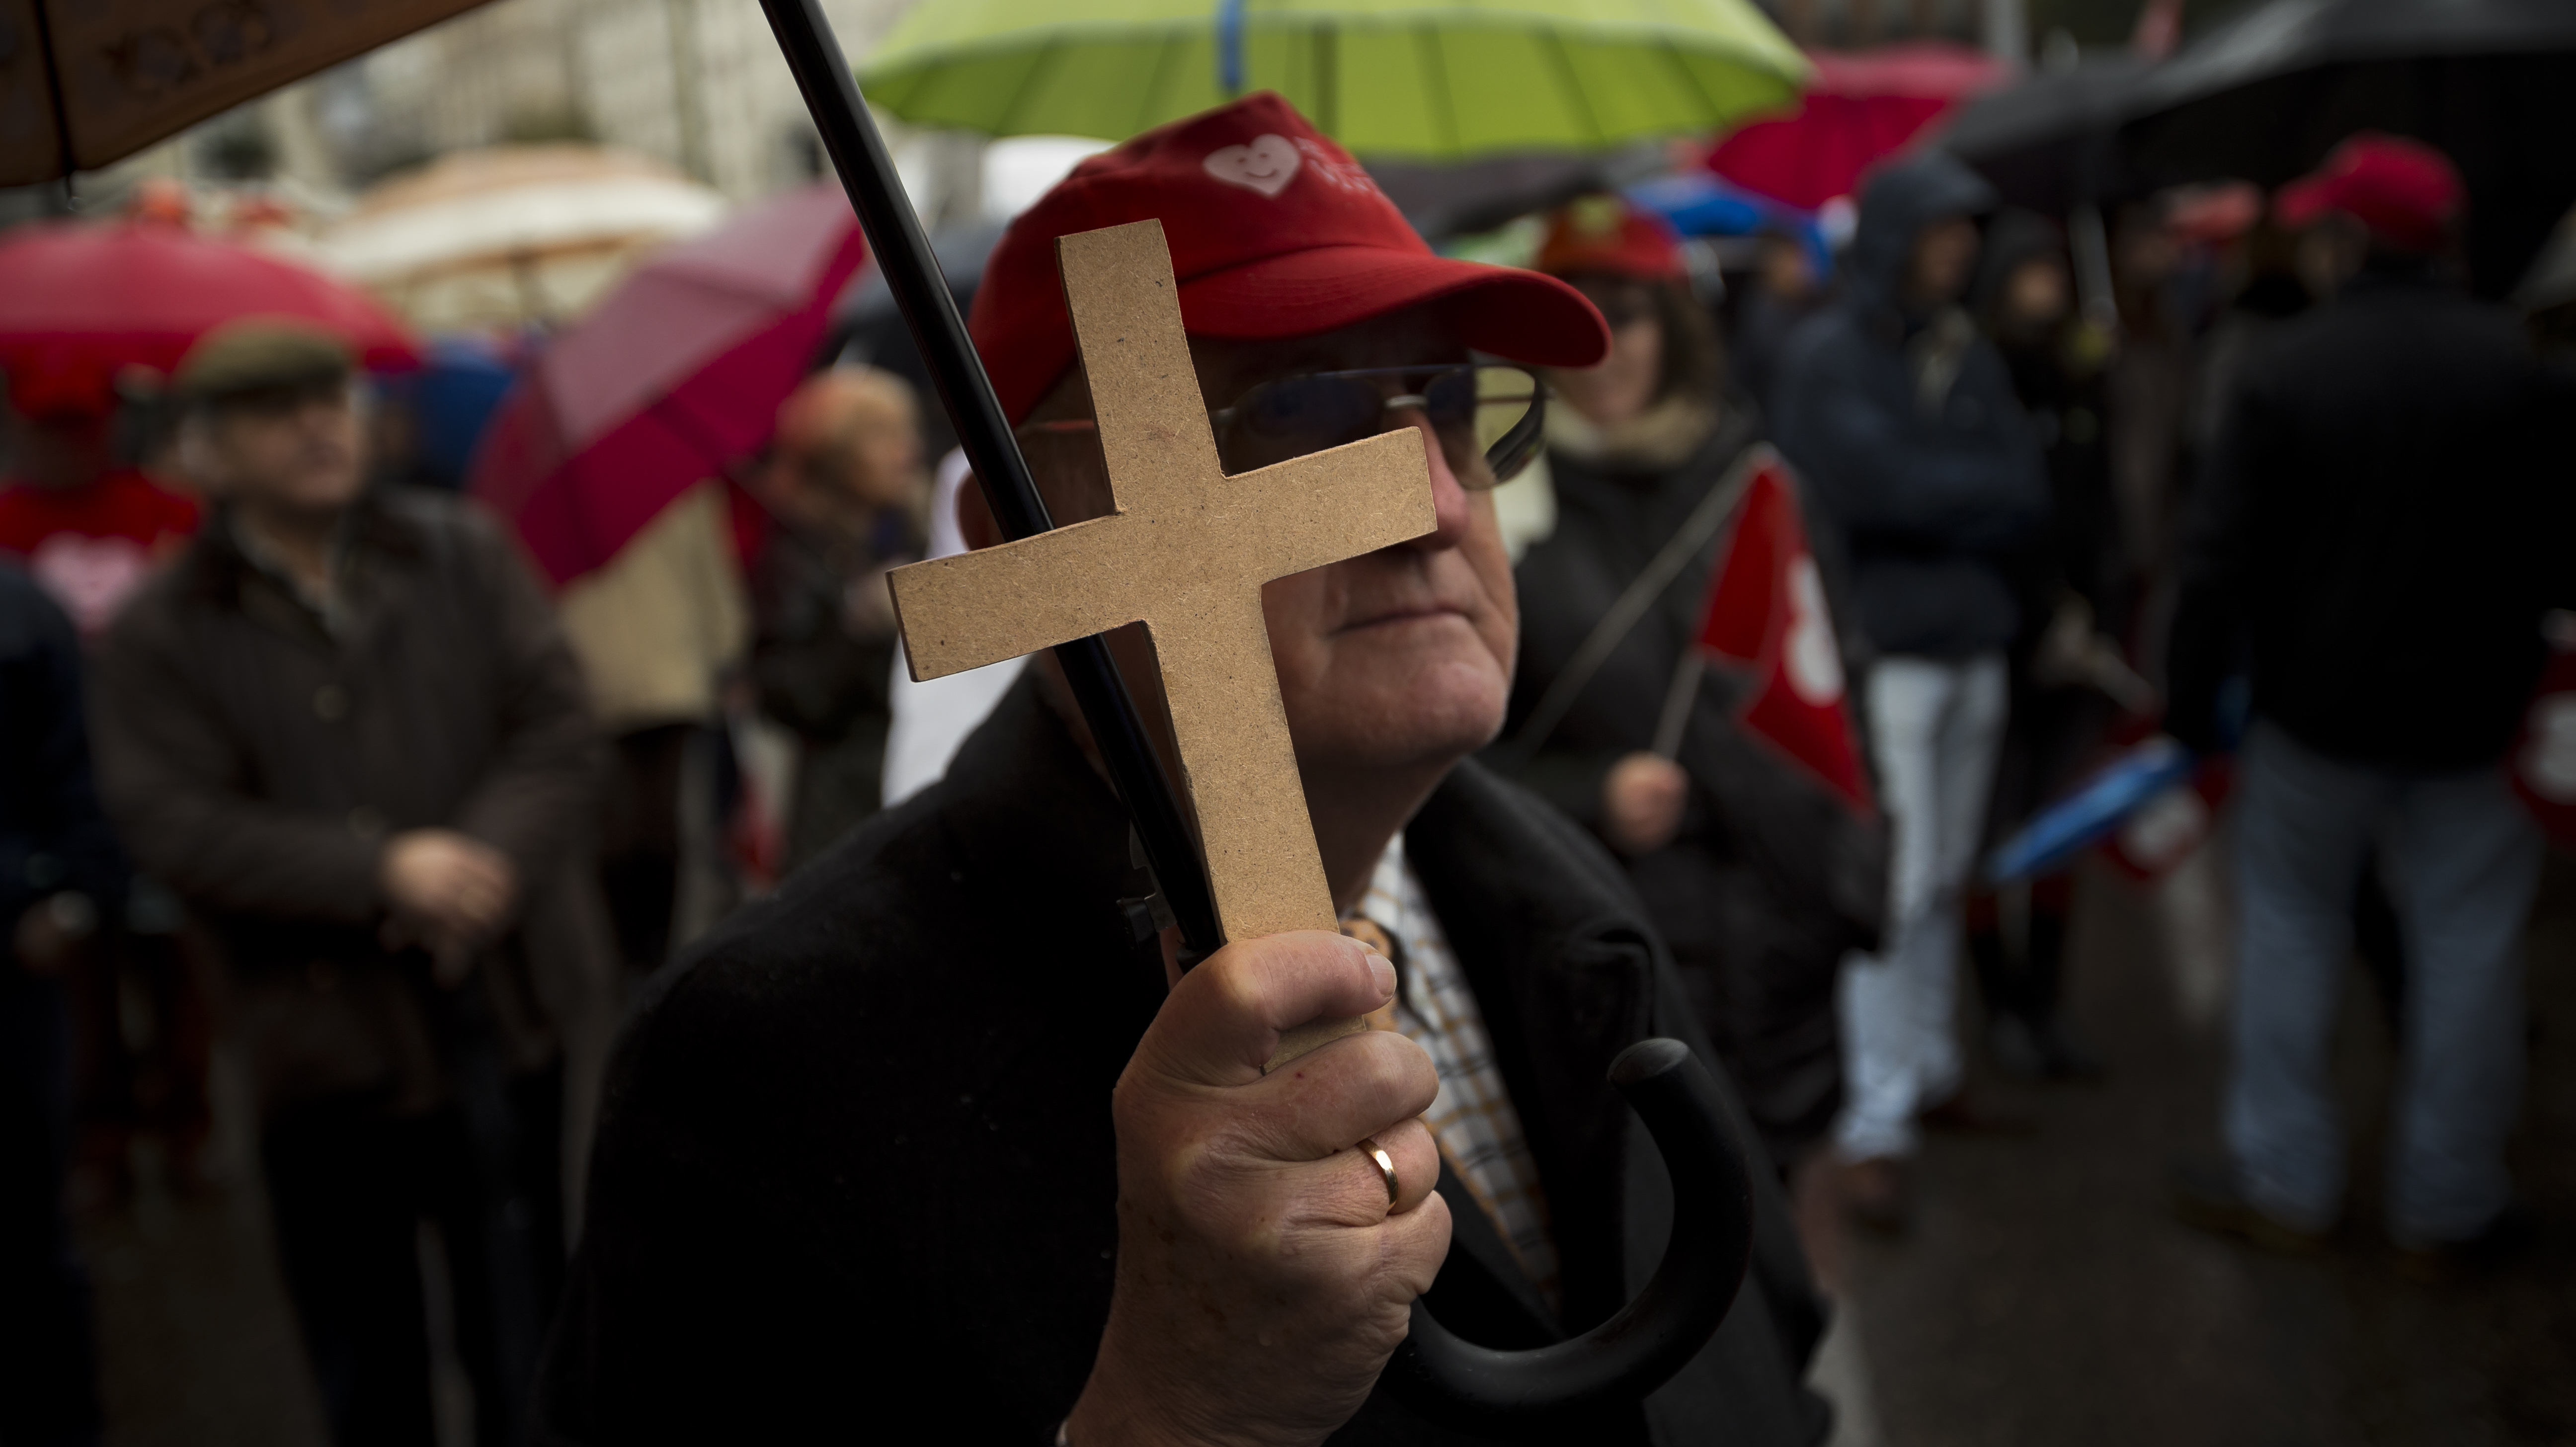 Anti-Abortion Push Has Spain Debating Definition Of 'Progress'